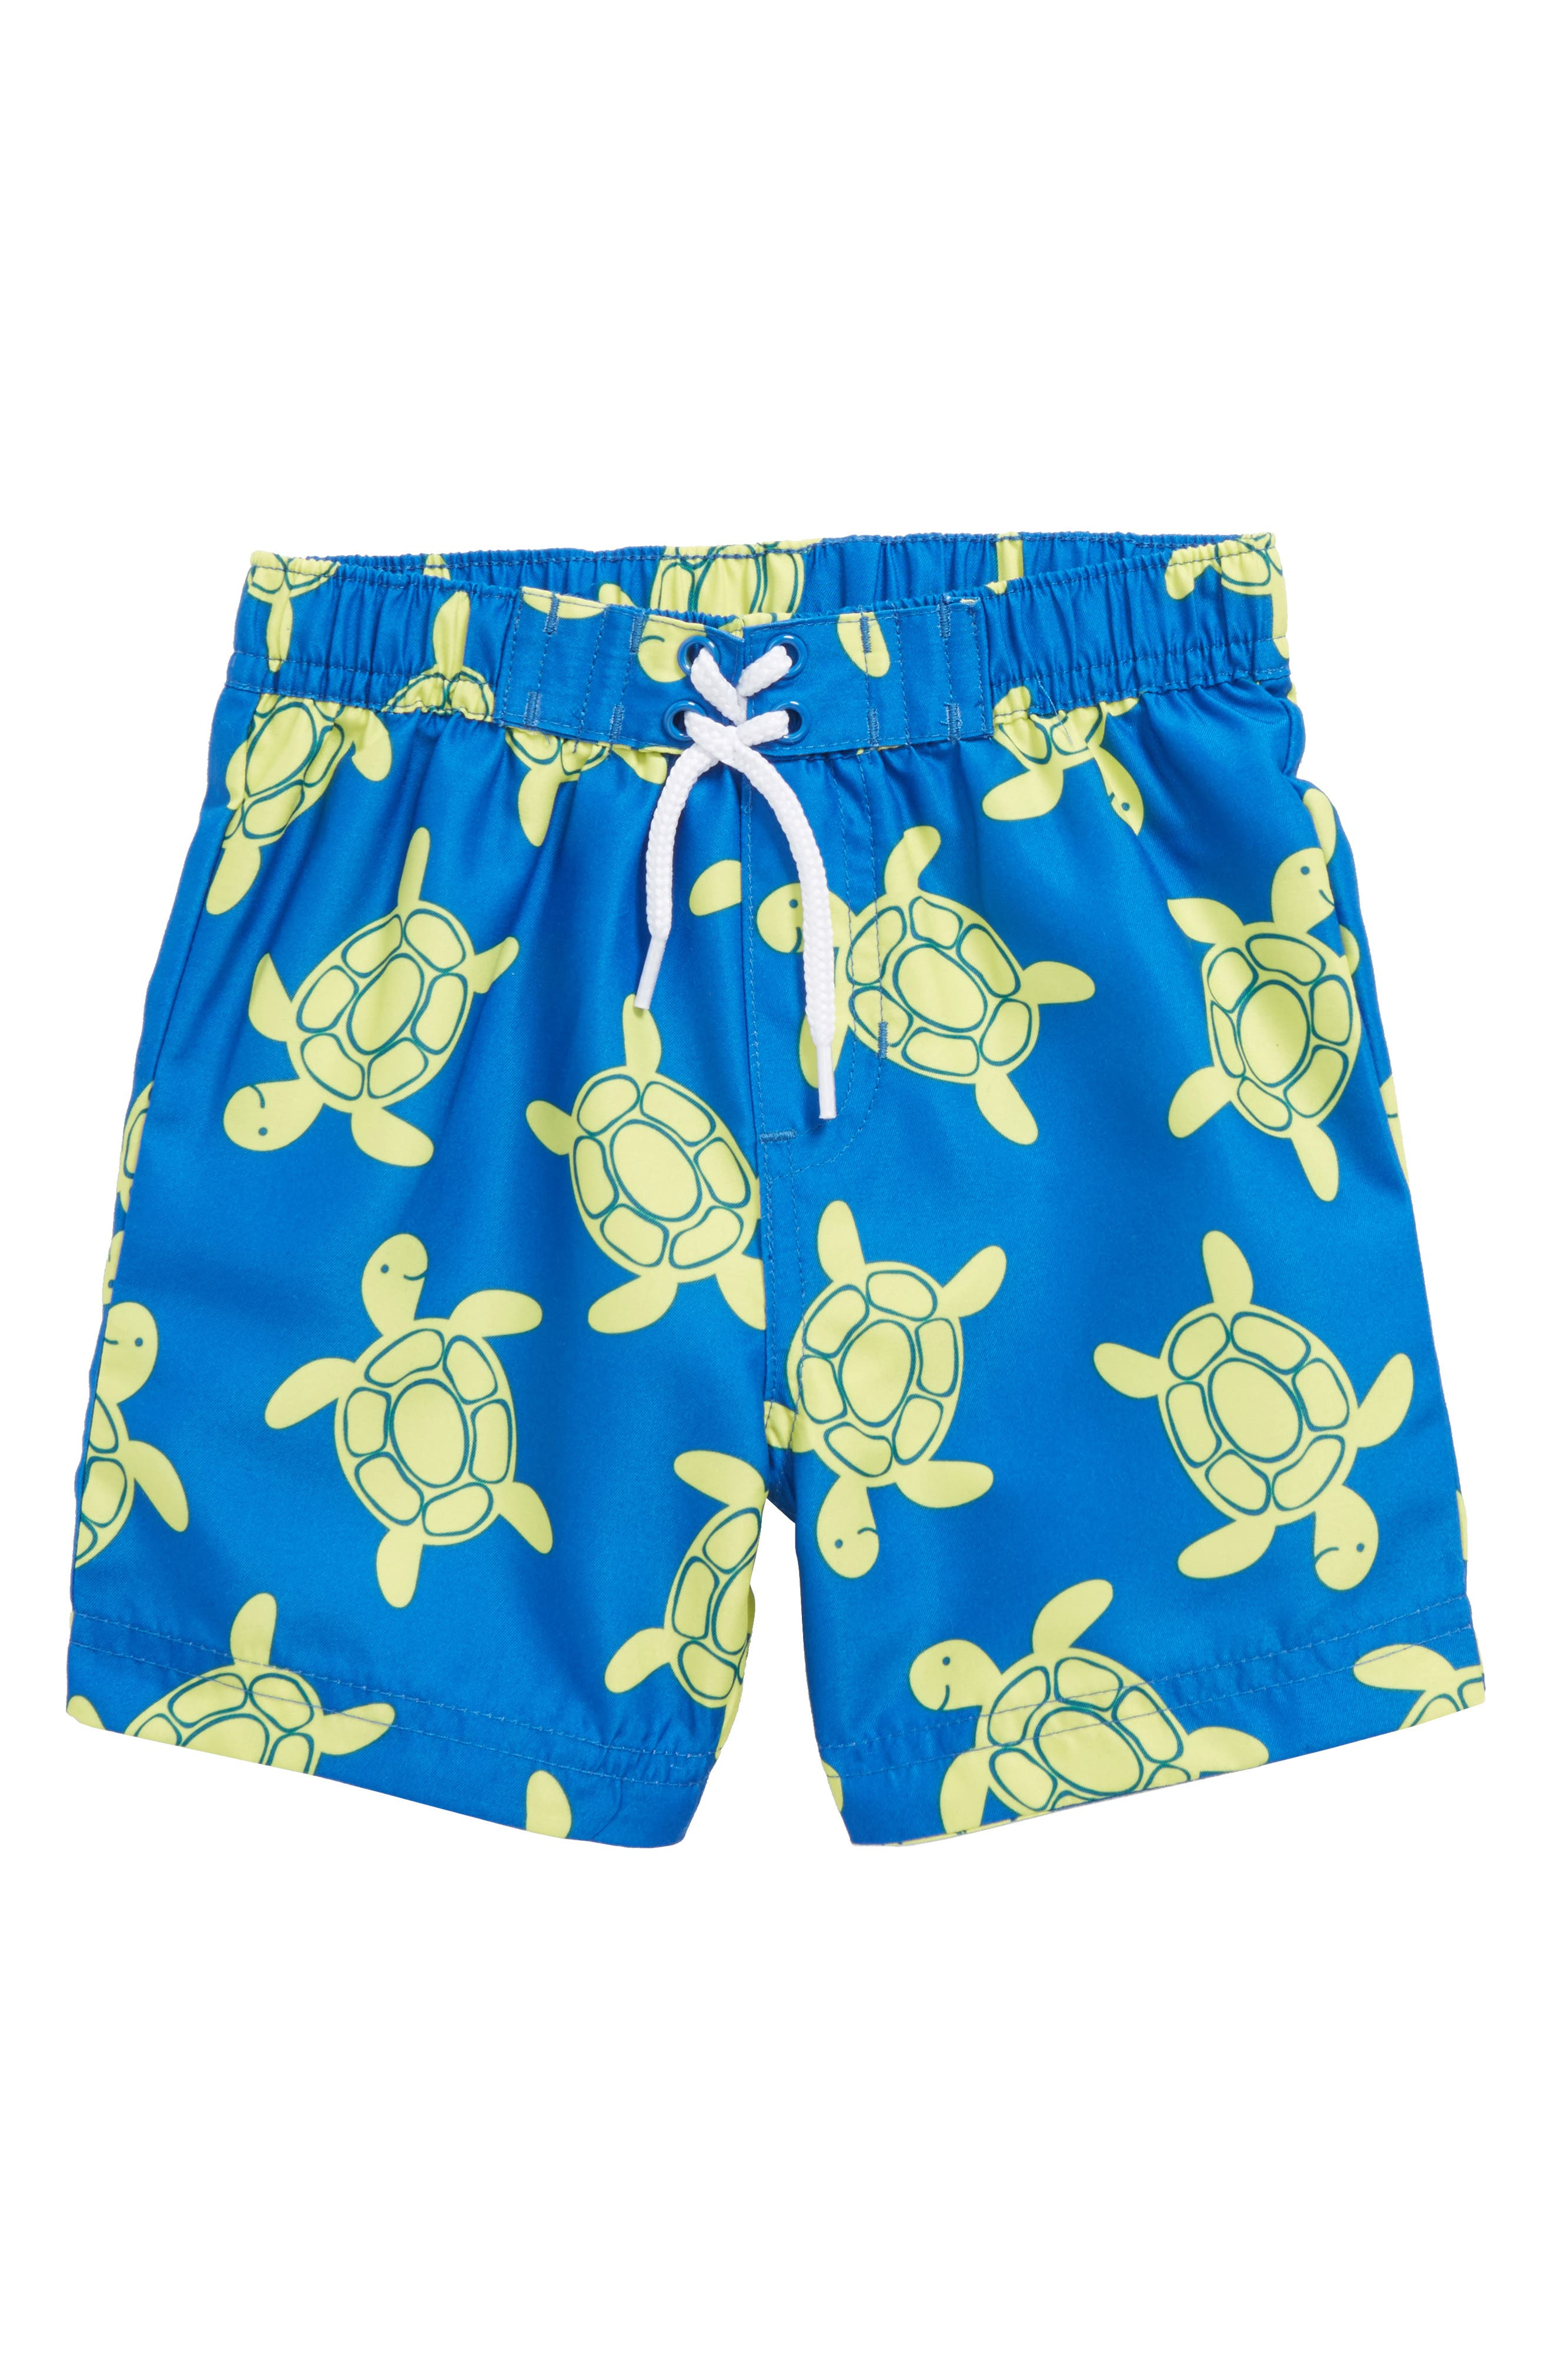 Turtle UPF 50+ Swim Trunks,                         Main,                         color,